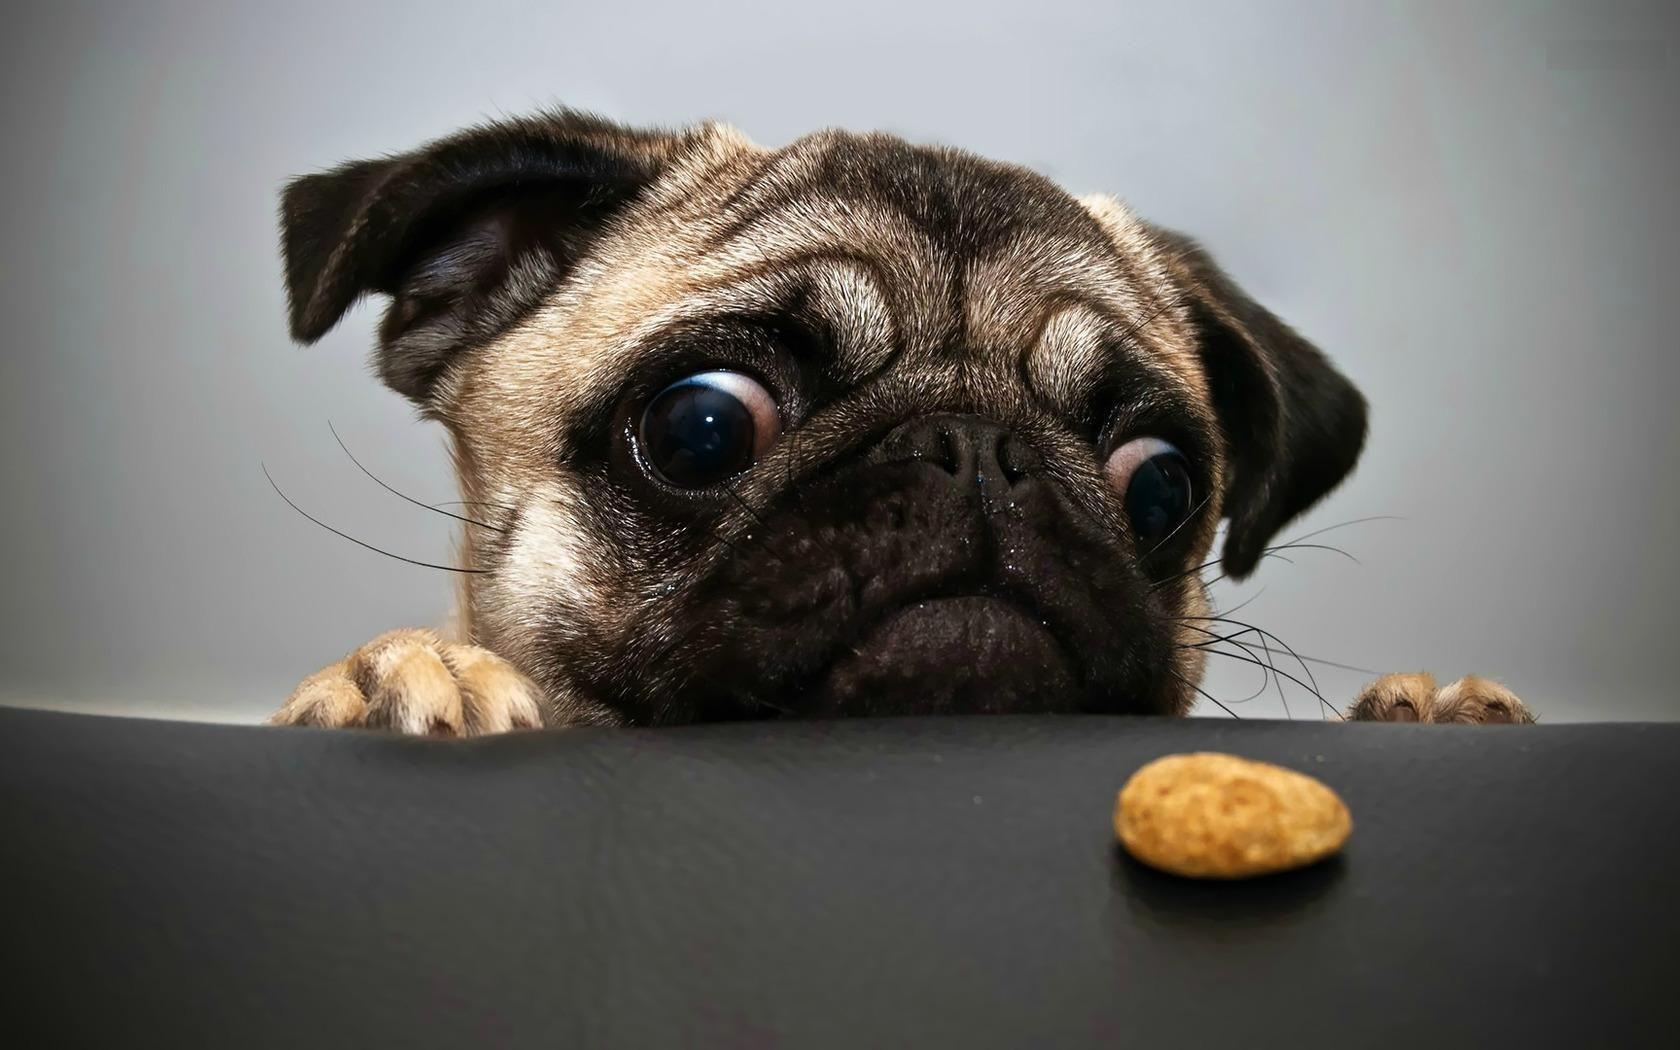 Pug Will Power Cute Pugs Pug Puppies Dog Wallpaper